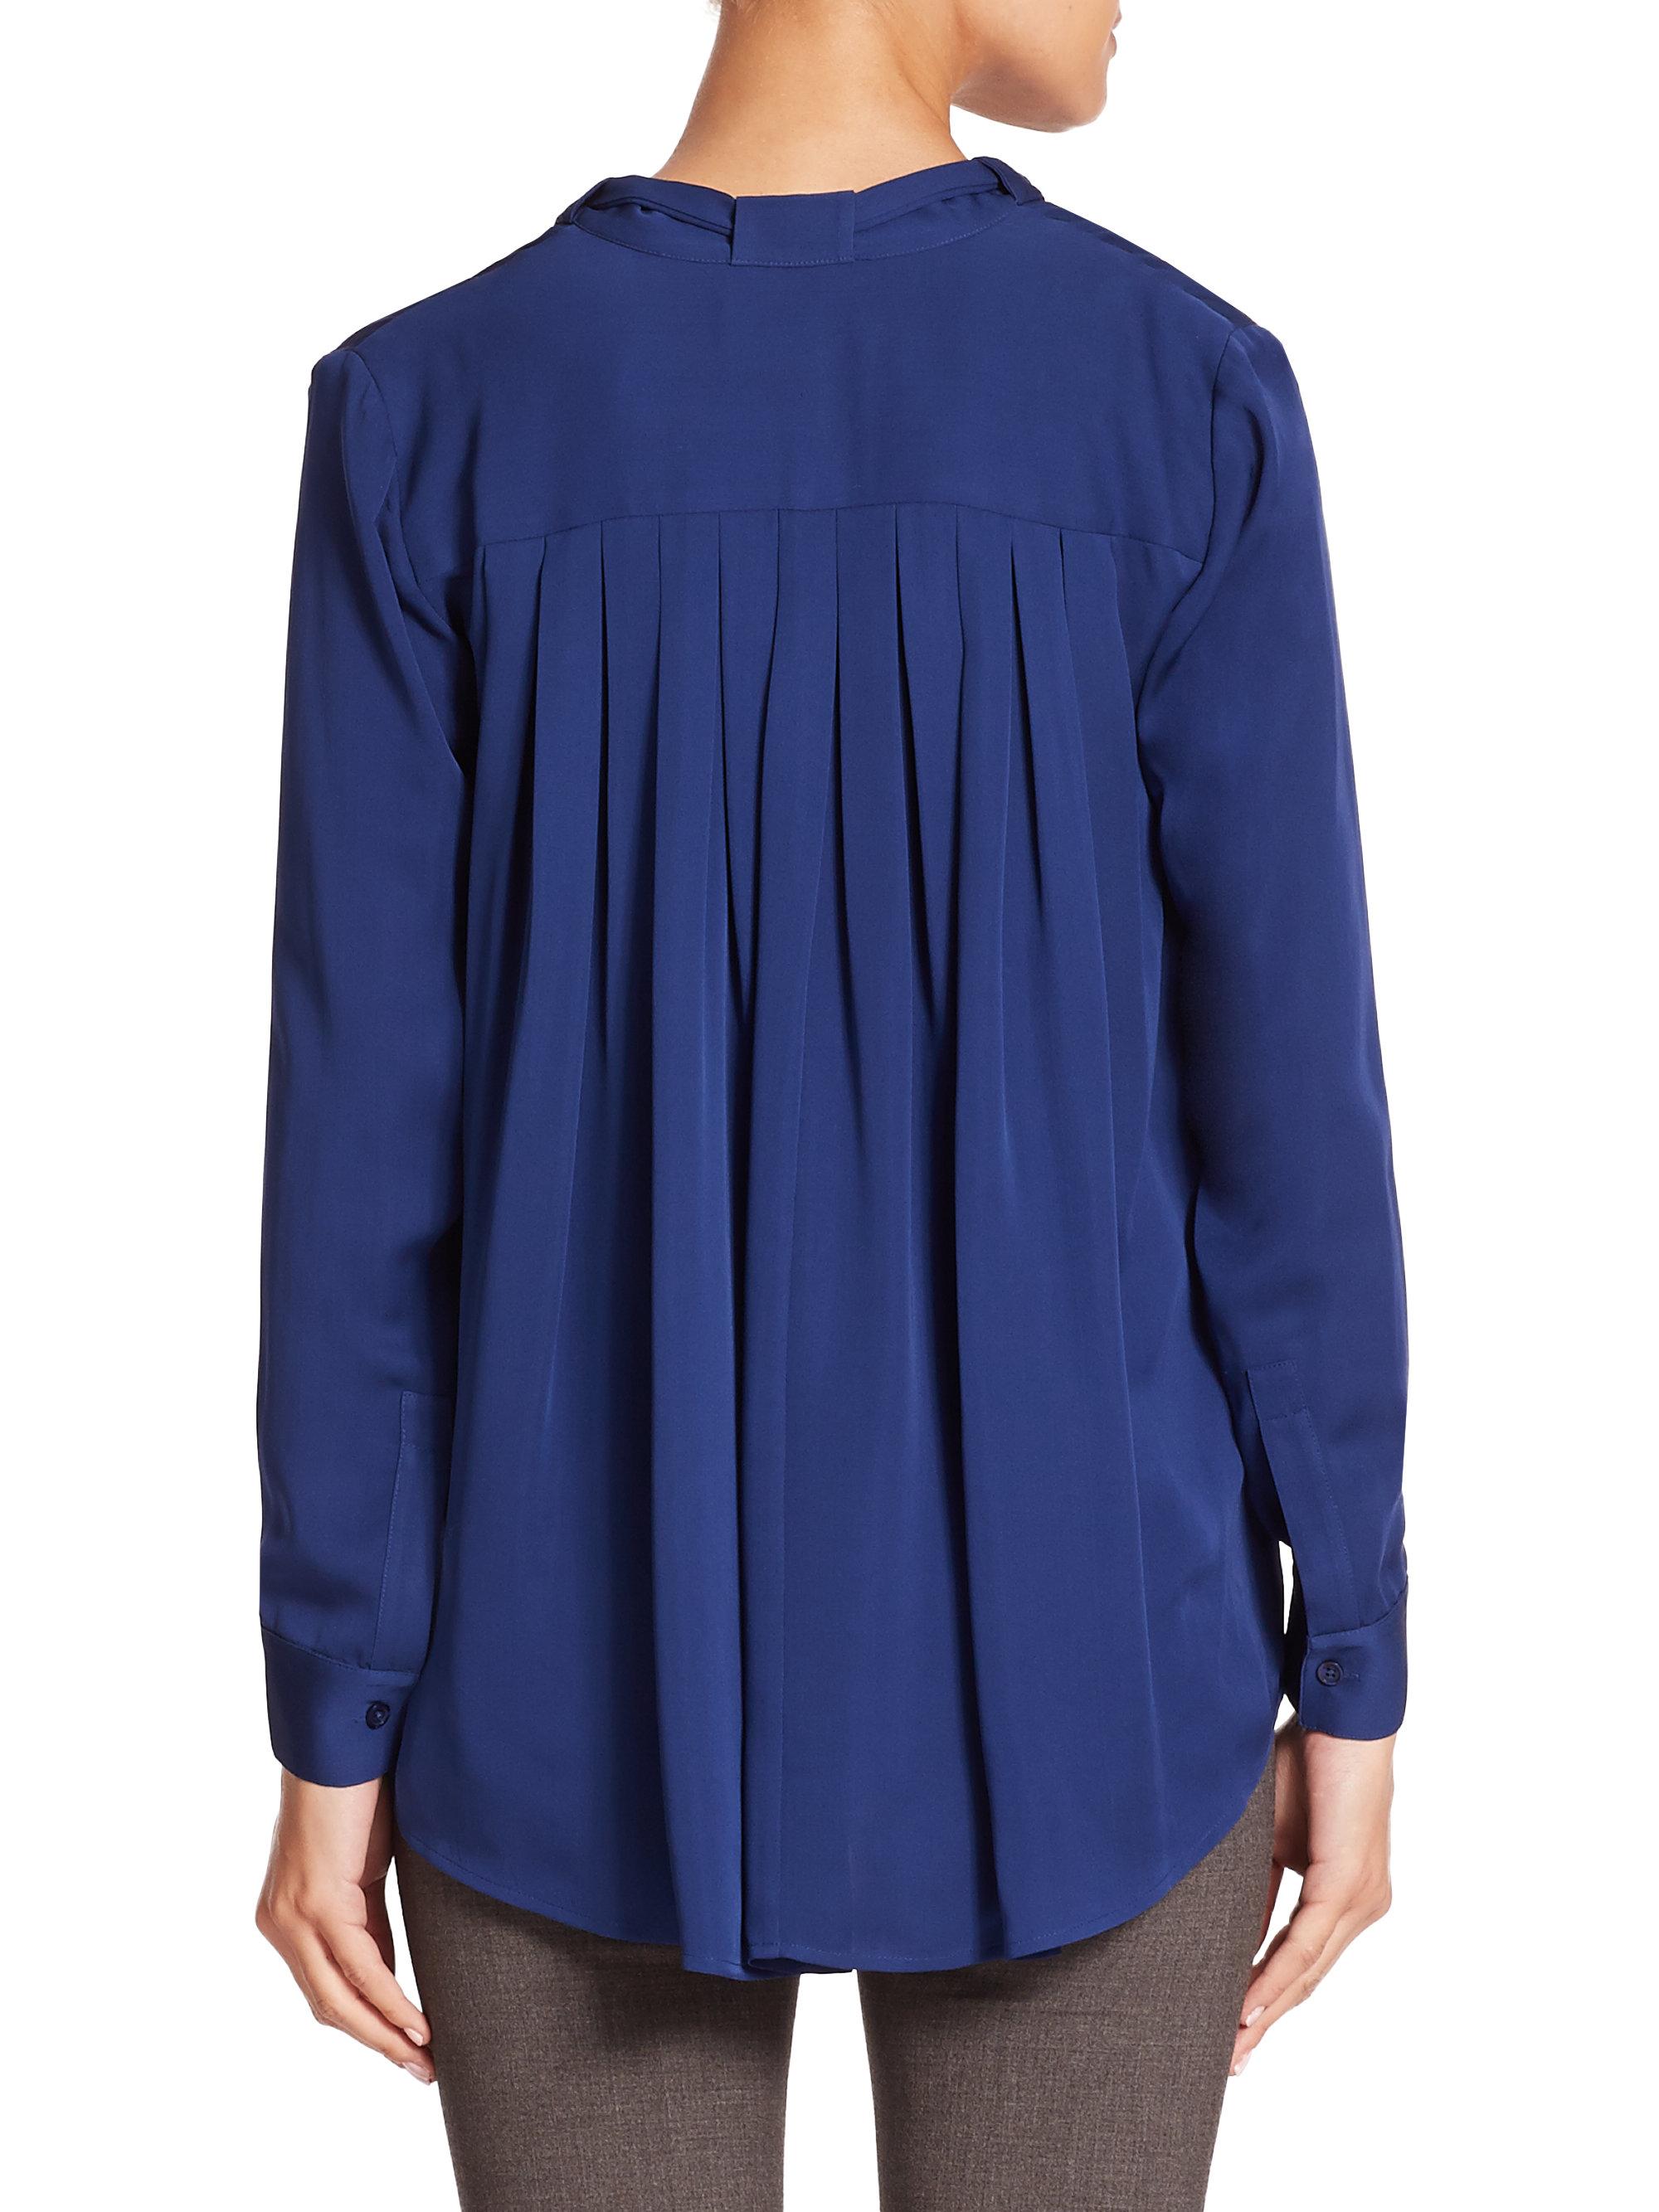 877124213835a Lyst - Michael Michael Kors Silk Tie-neck Blouse in Blue